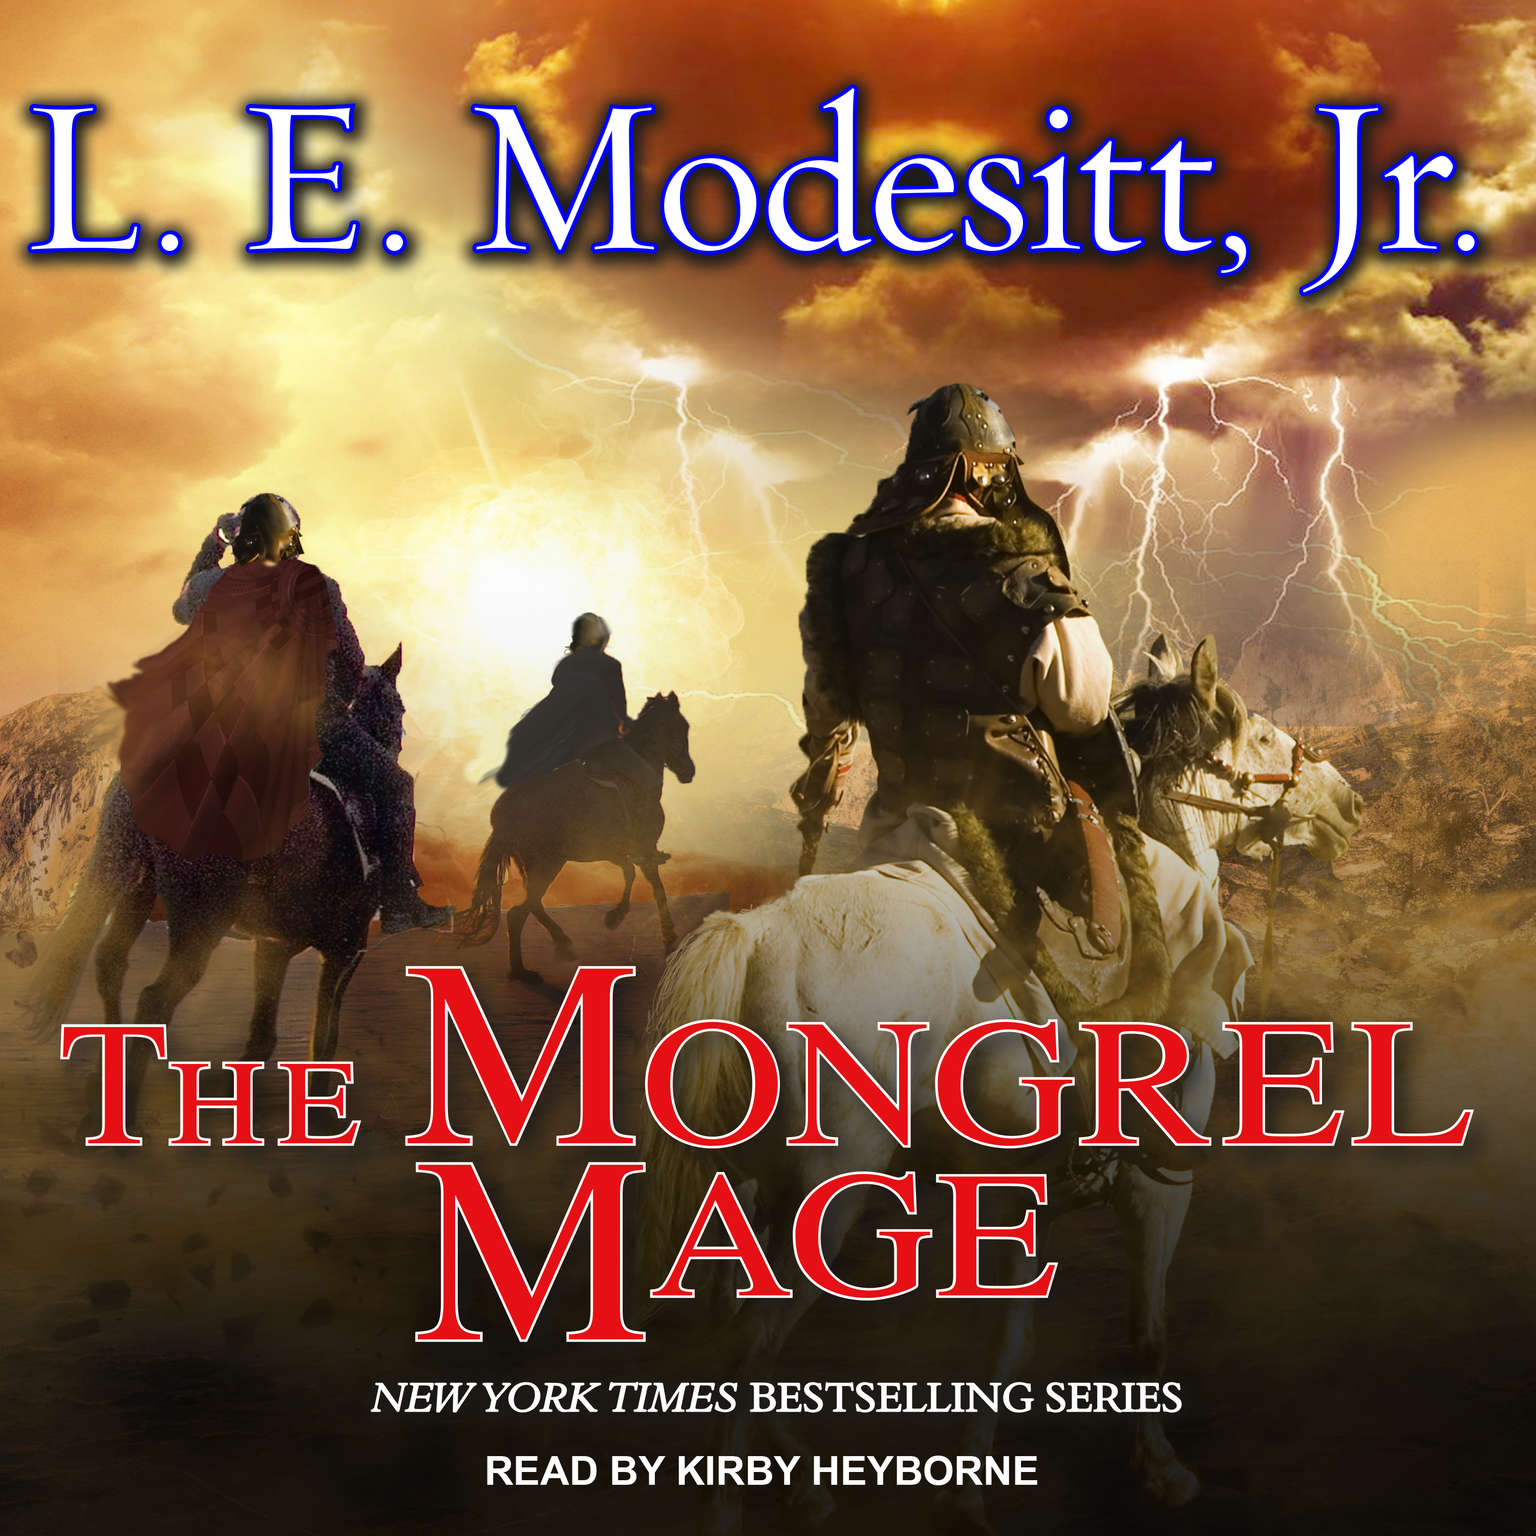 The Mongrel Mage Audiobook, by L. E. Modesitt